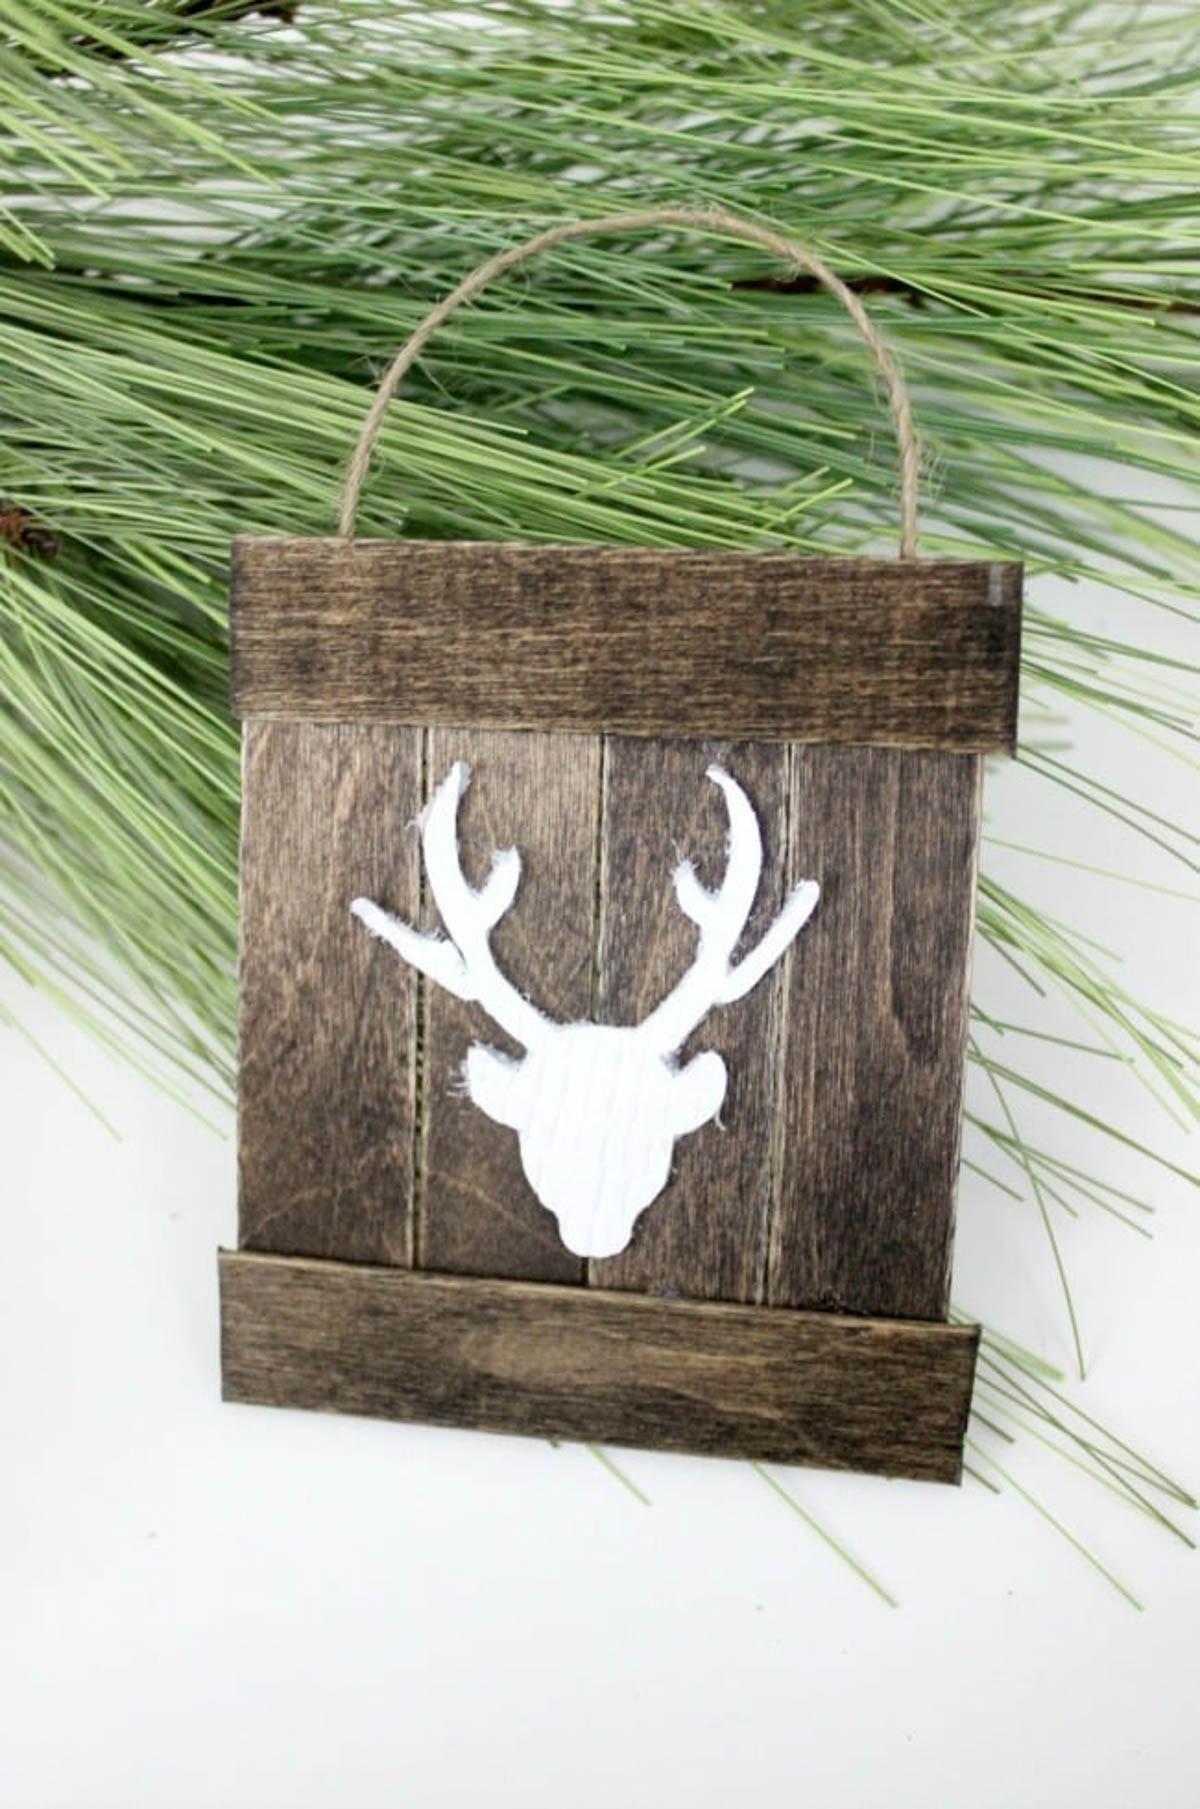 Image of a DIY mini deer pallet ornament